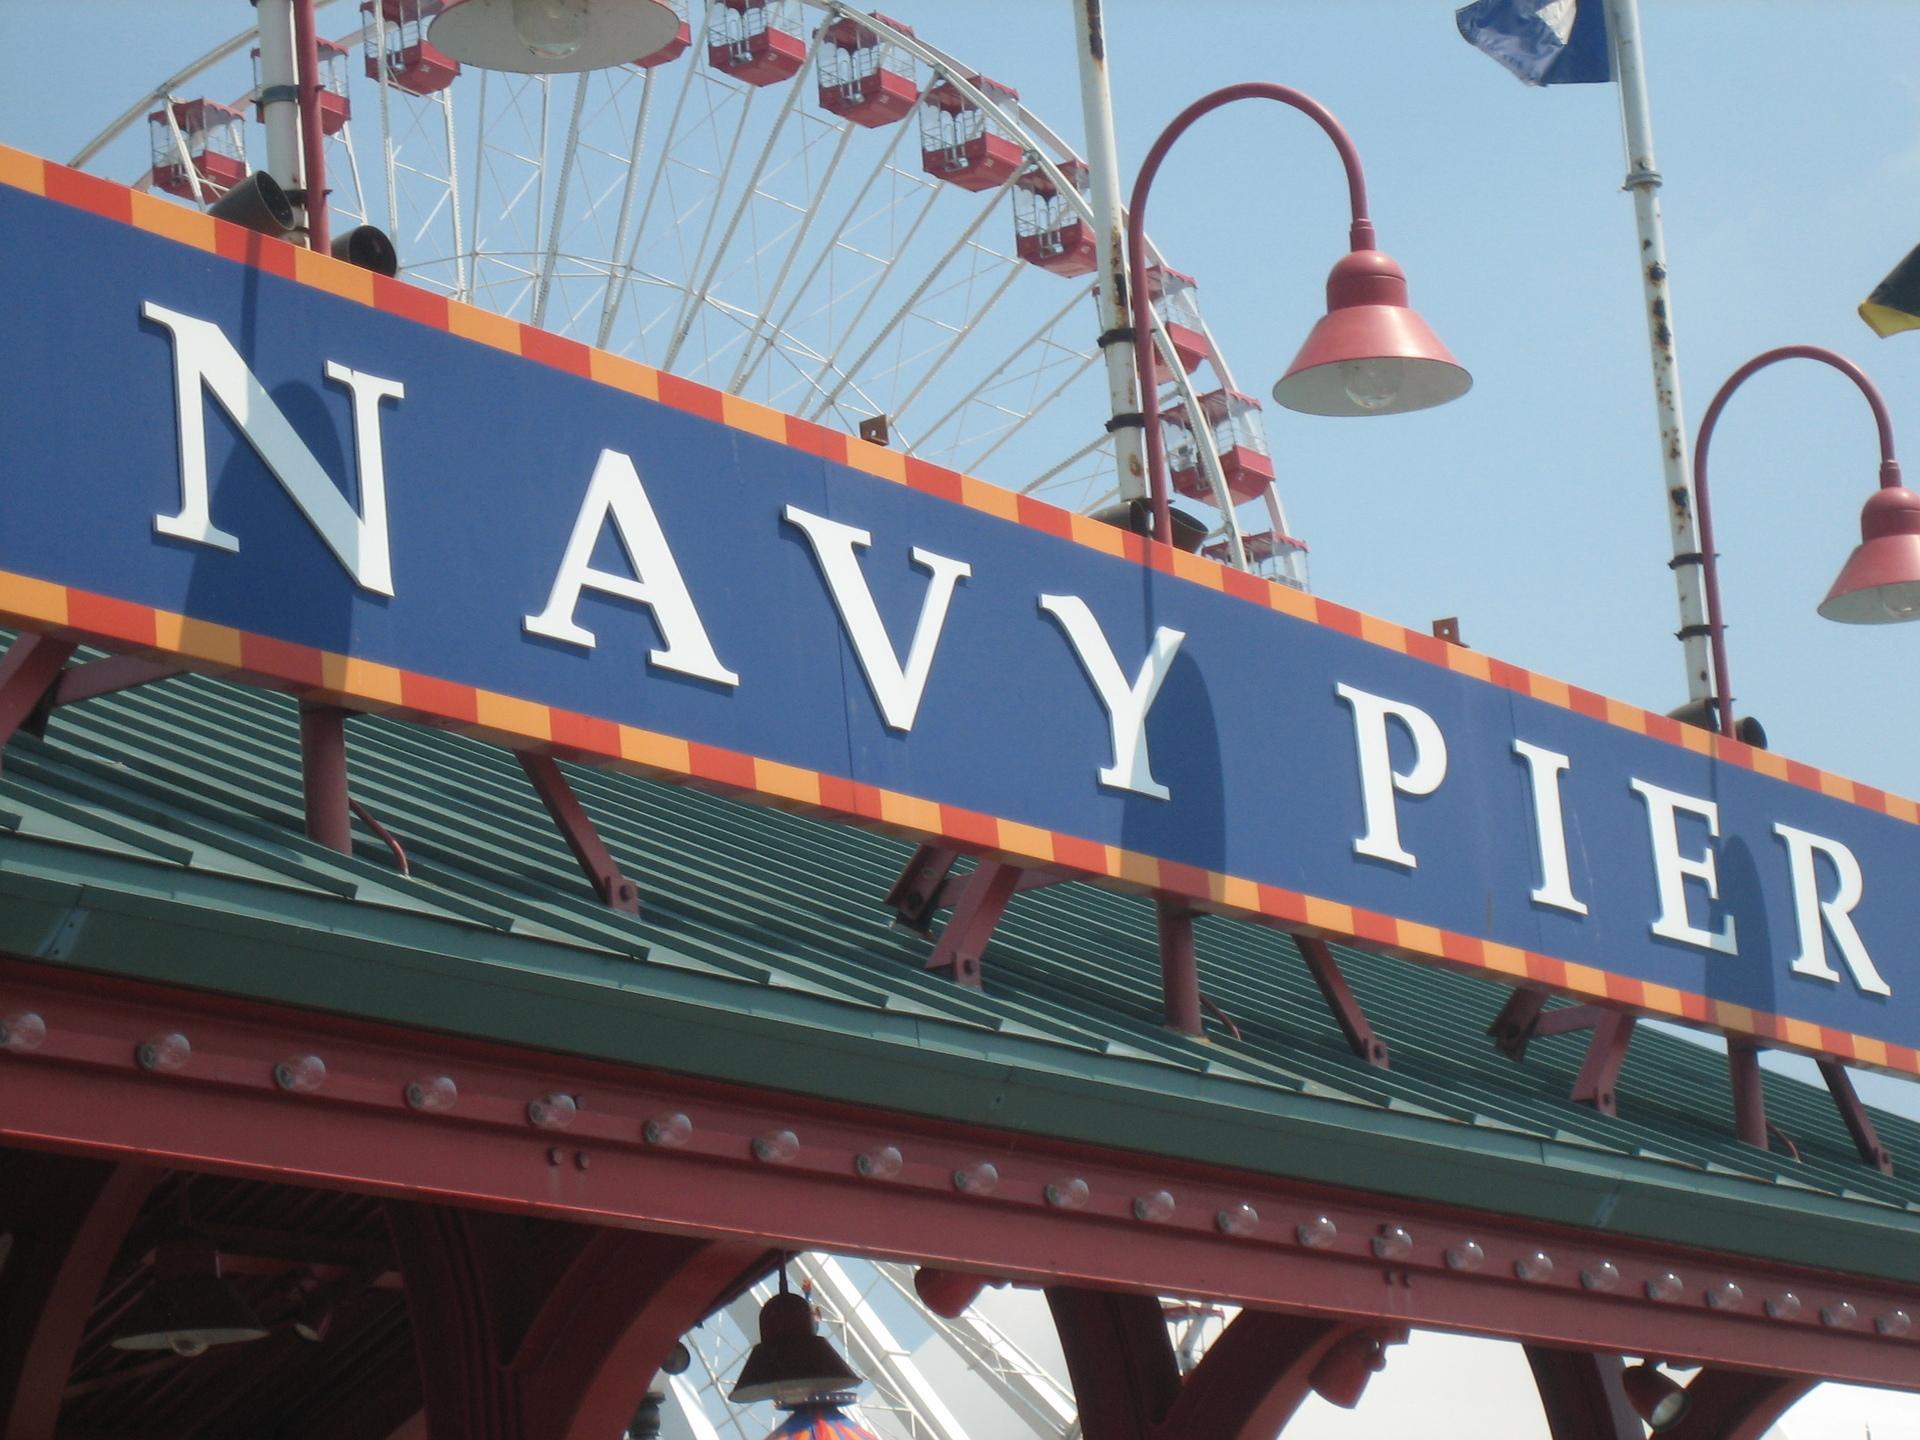 navy pier chicago wallpaper - photo #22